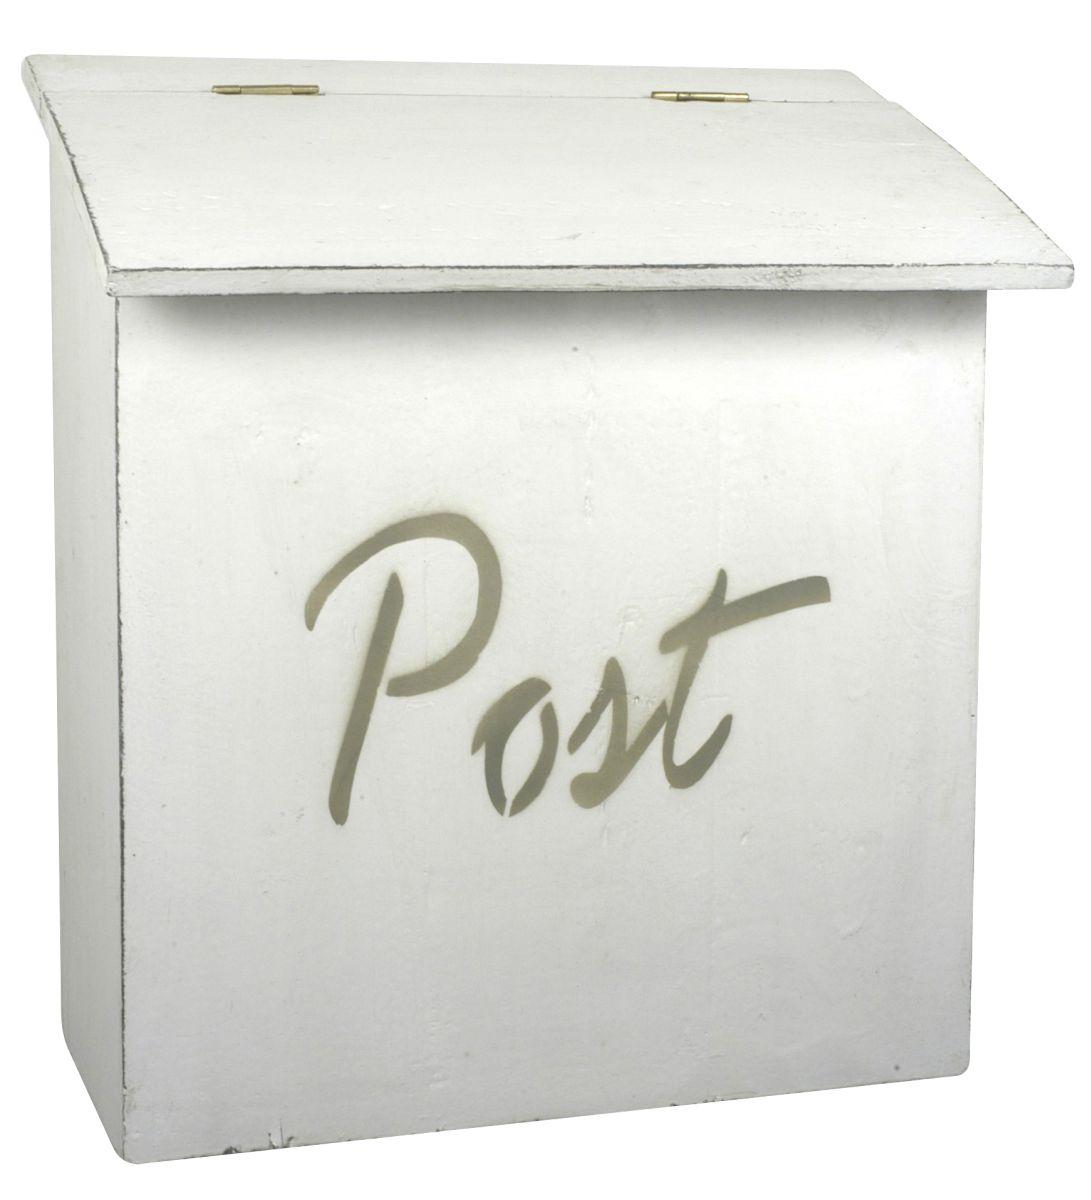 ib laursen briefkasten post wei holz postkasten 2213 11 shabby vintage ebay. Black Bedroom Furniture Sets. Home Design Ideas